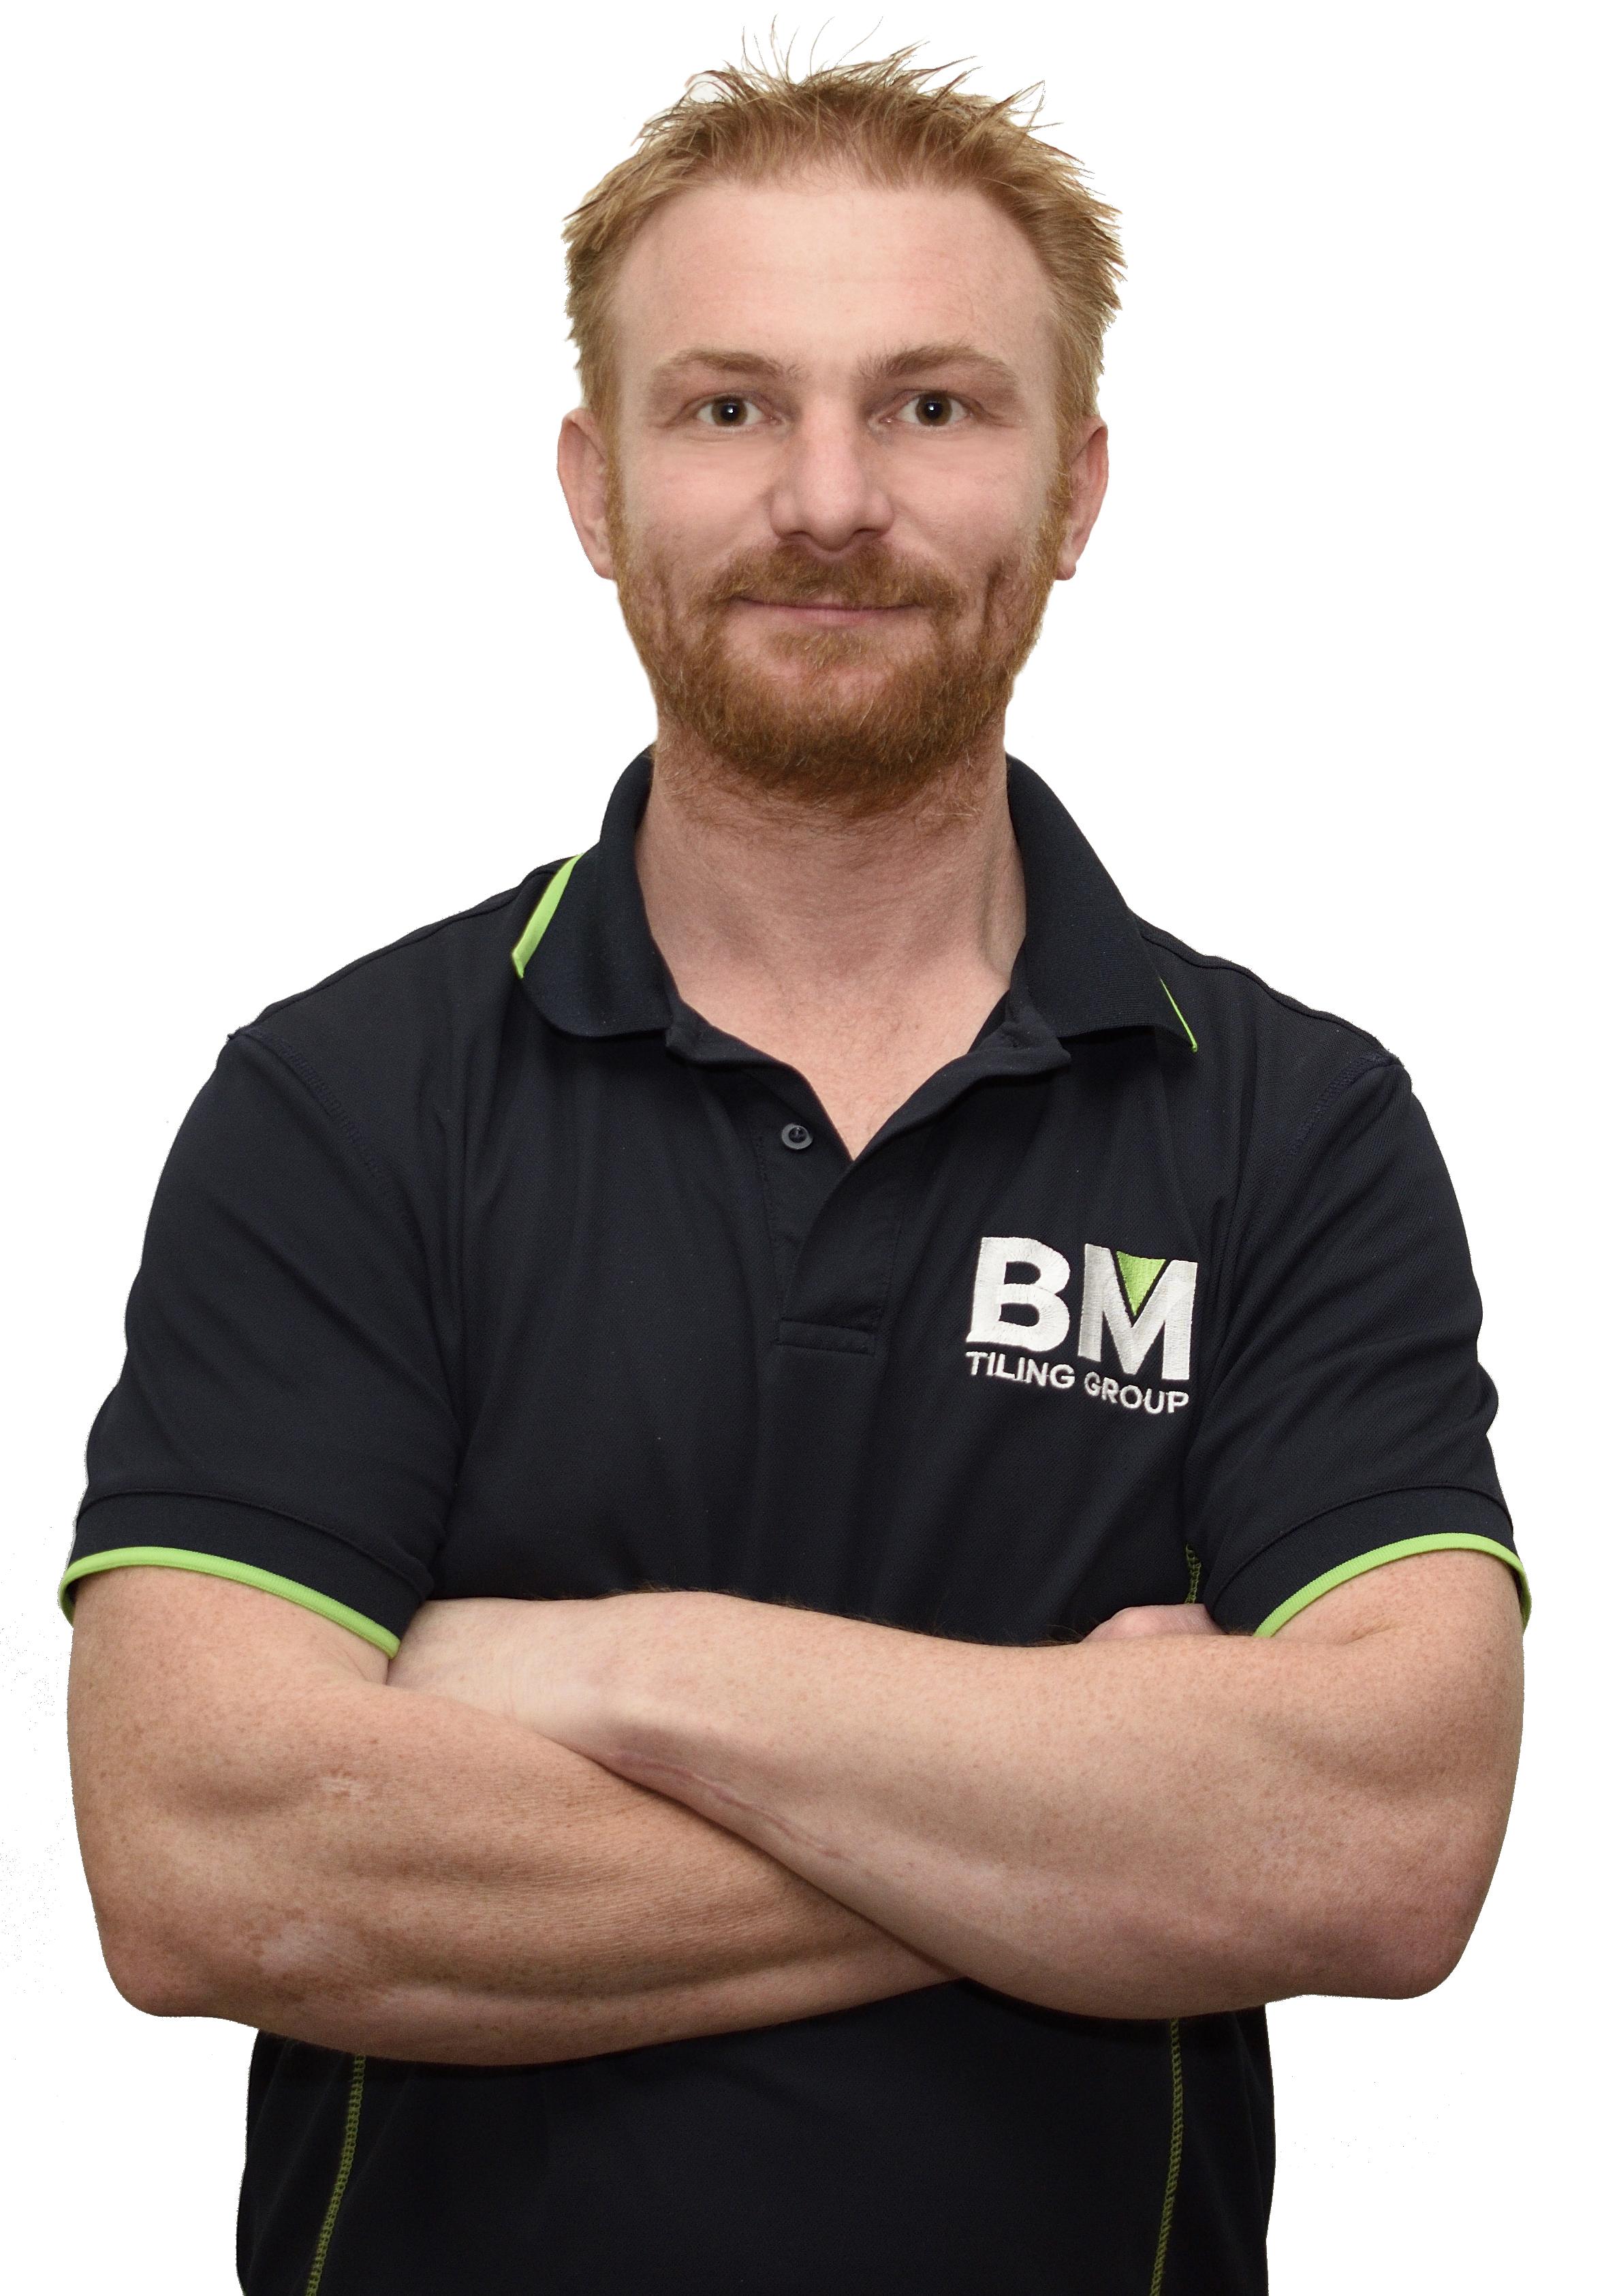 Mauro-Bortolin-BM-Tling-Group_2018.jpg